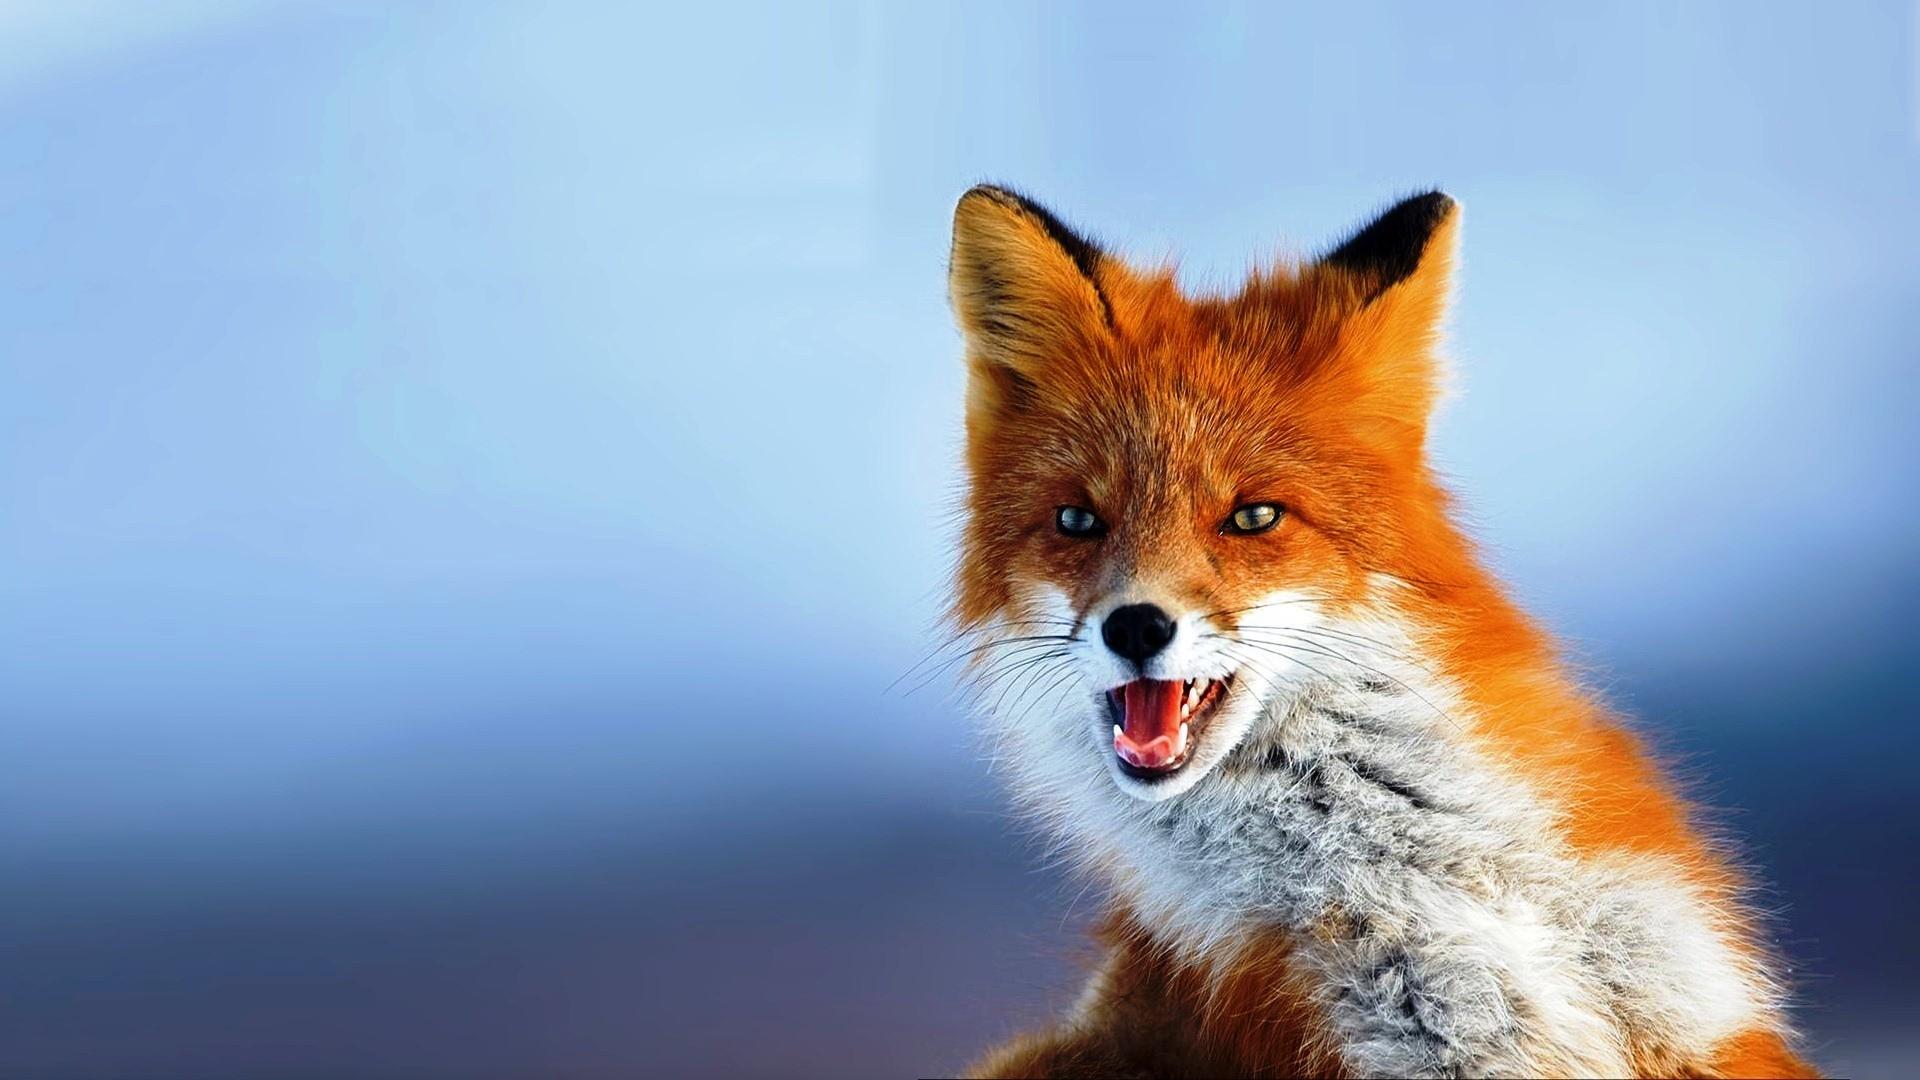 Desktop images animals